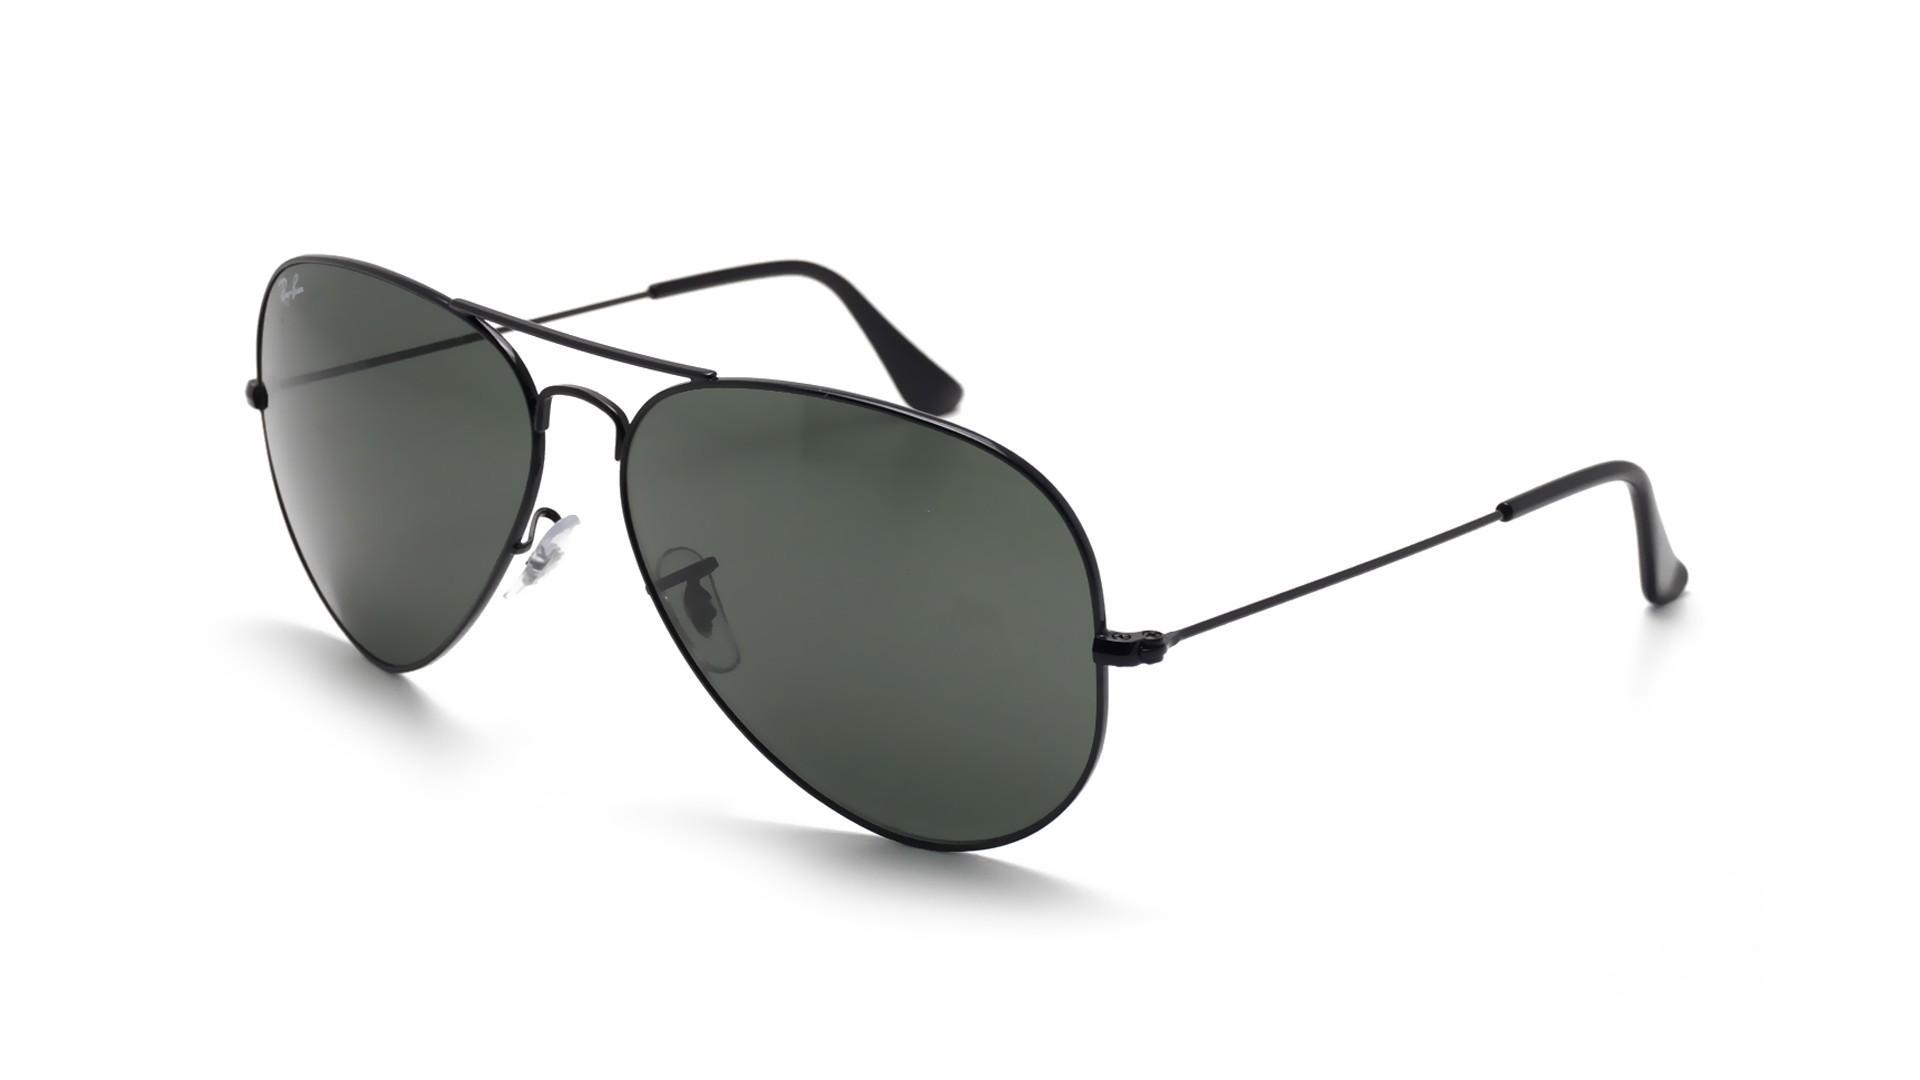 a8891ebcab6 Sunglasses Ray-Ban Aviator Large Metal Black G-15 RB 3026 L2821 62.14 140